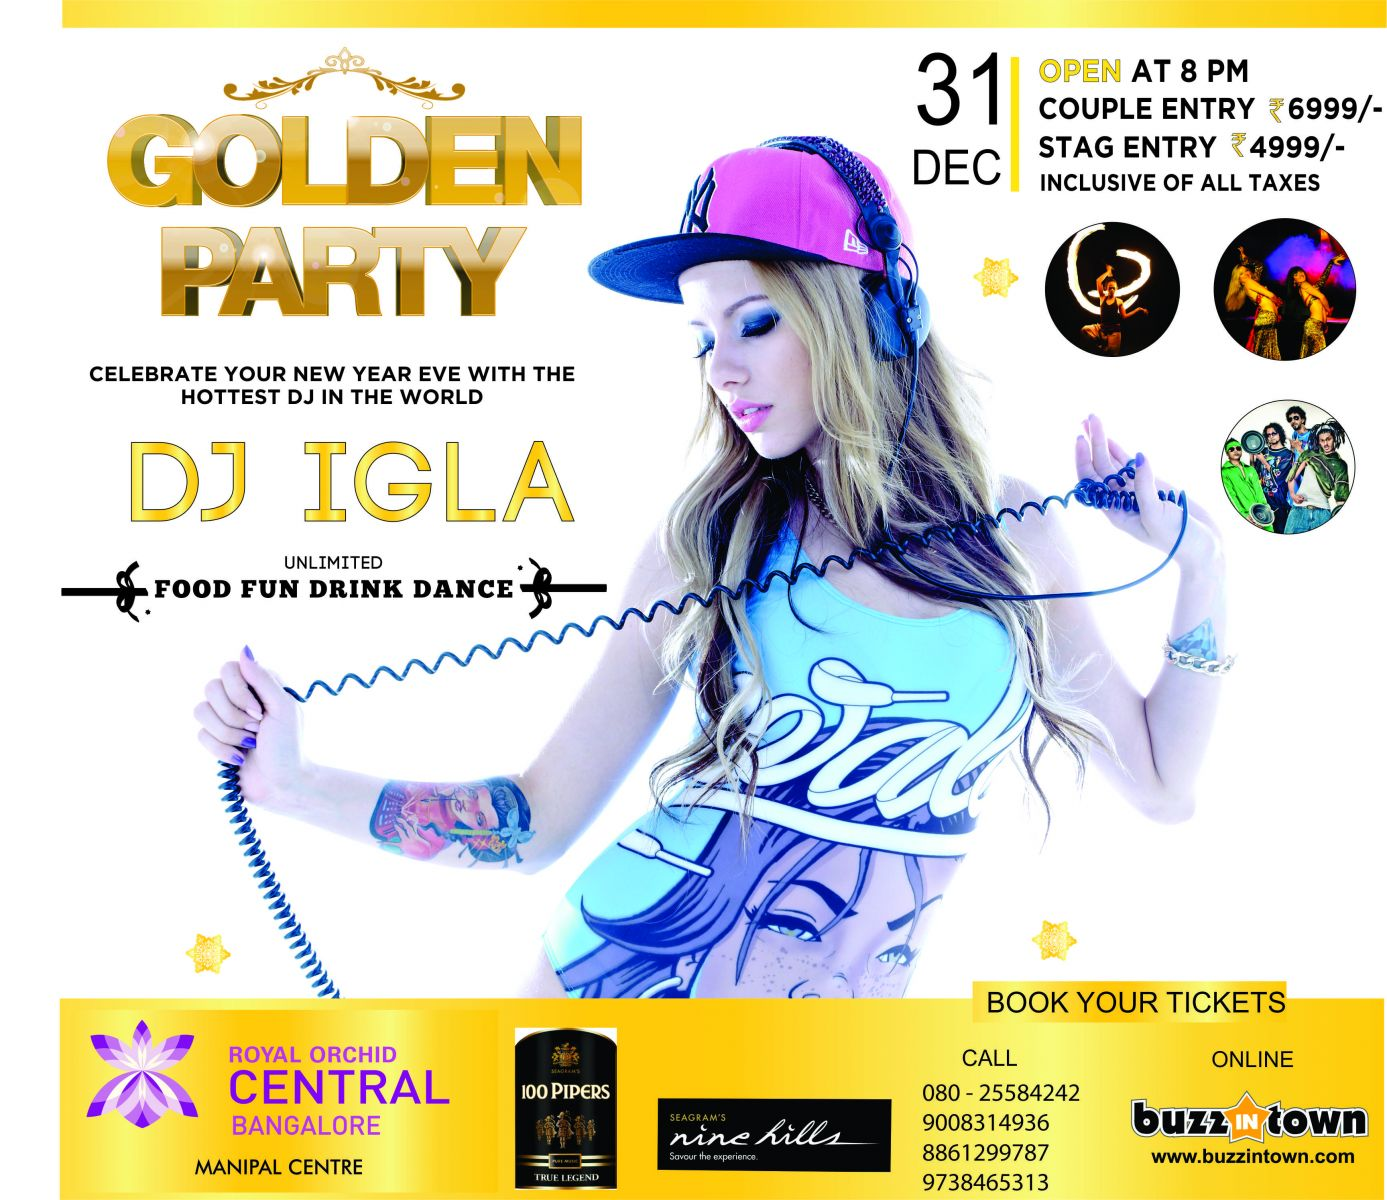 Golden_party_with_dj_igla